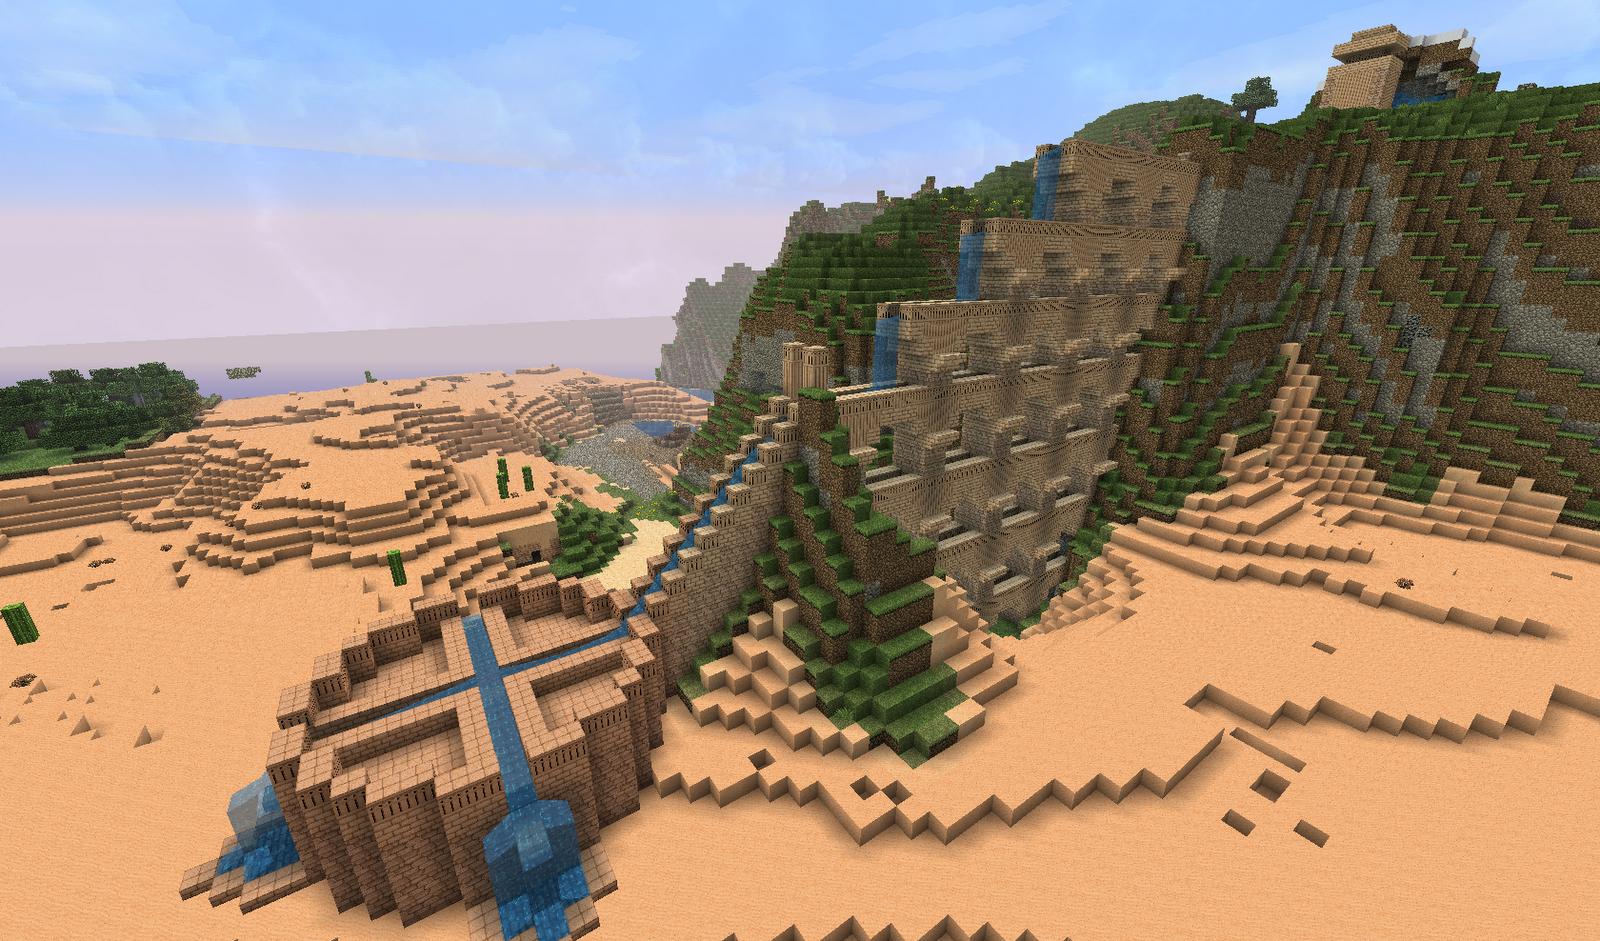 minecraft creations: Building ideas